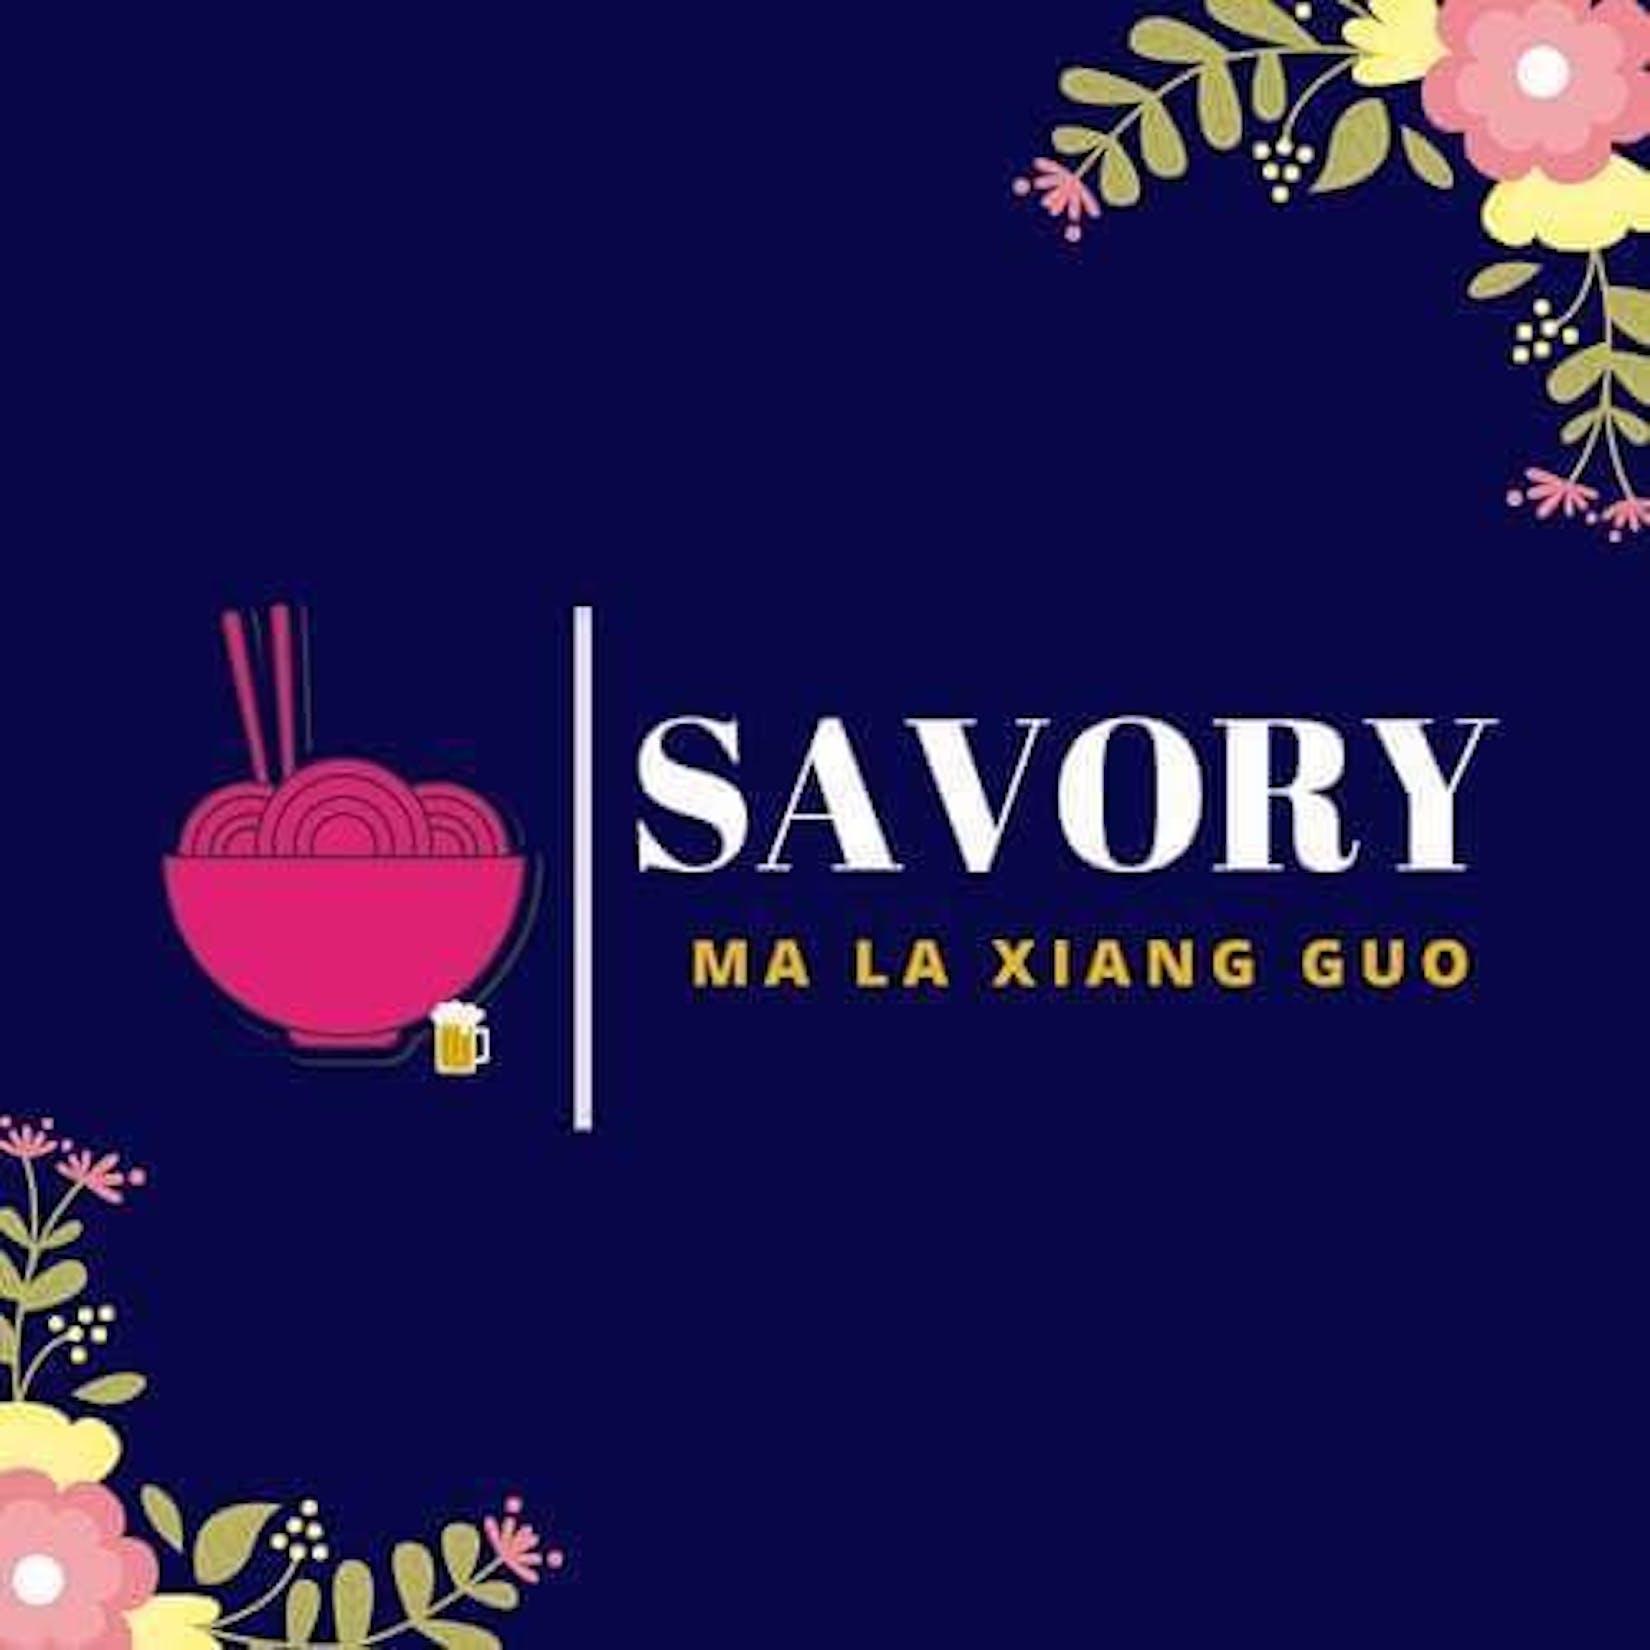 Savory Ma La Xiang Guo & Thai Food | yathar